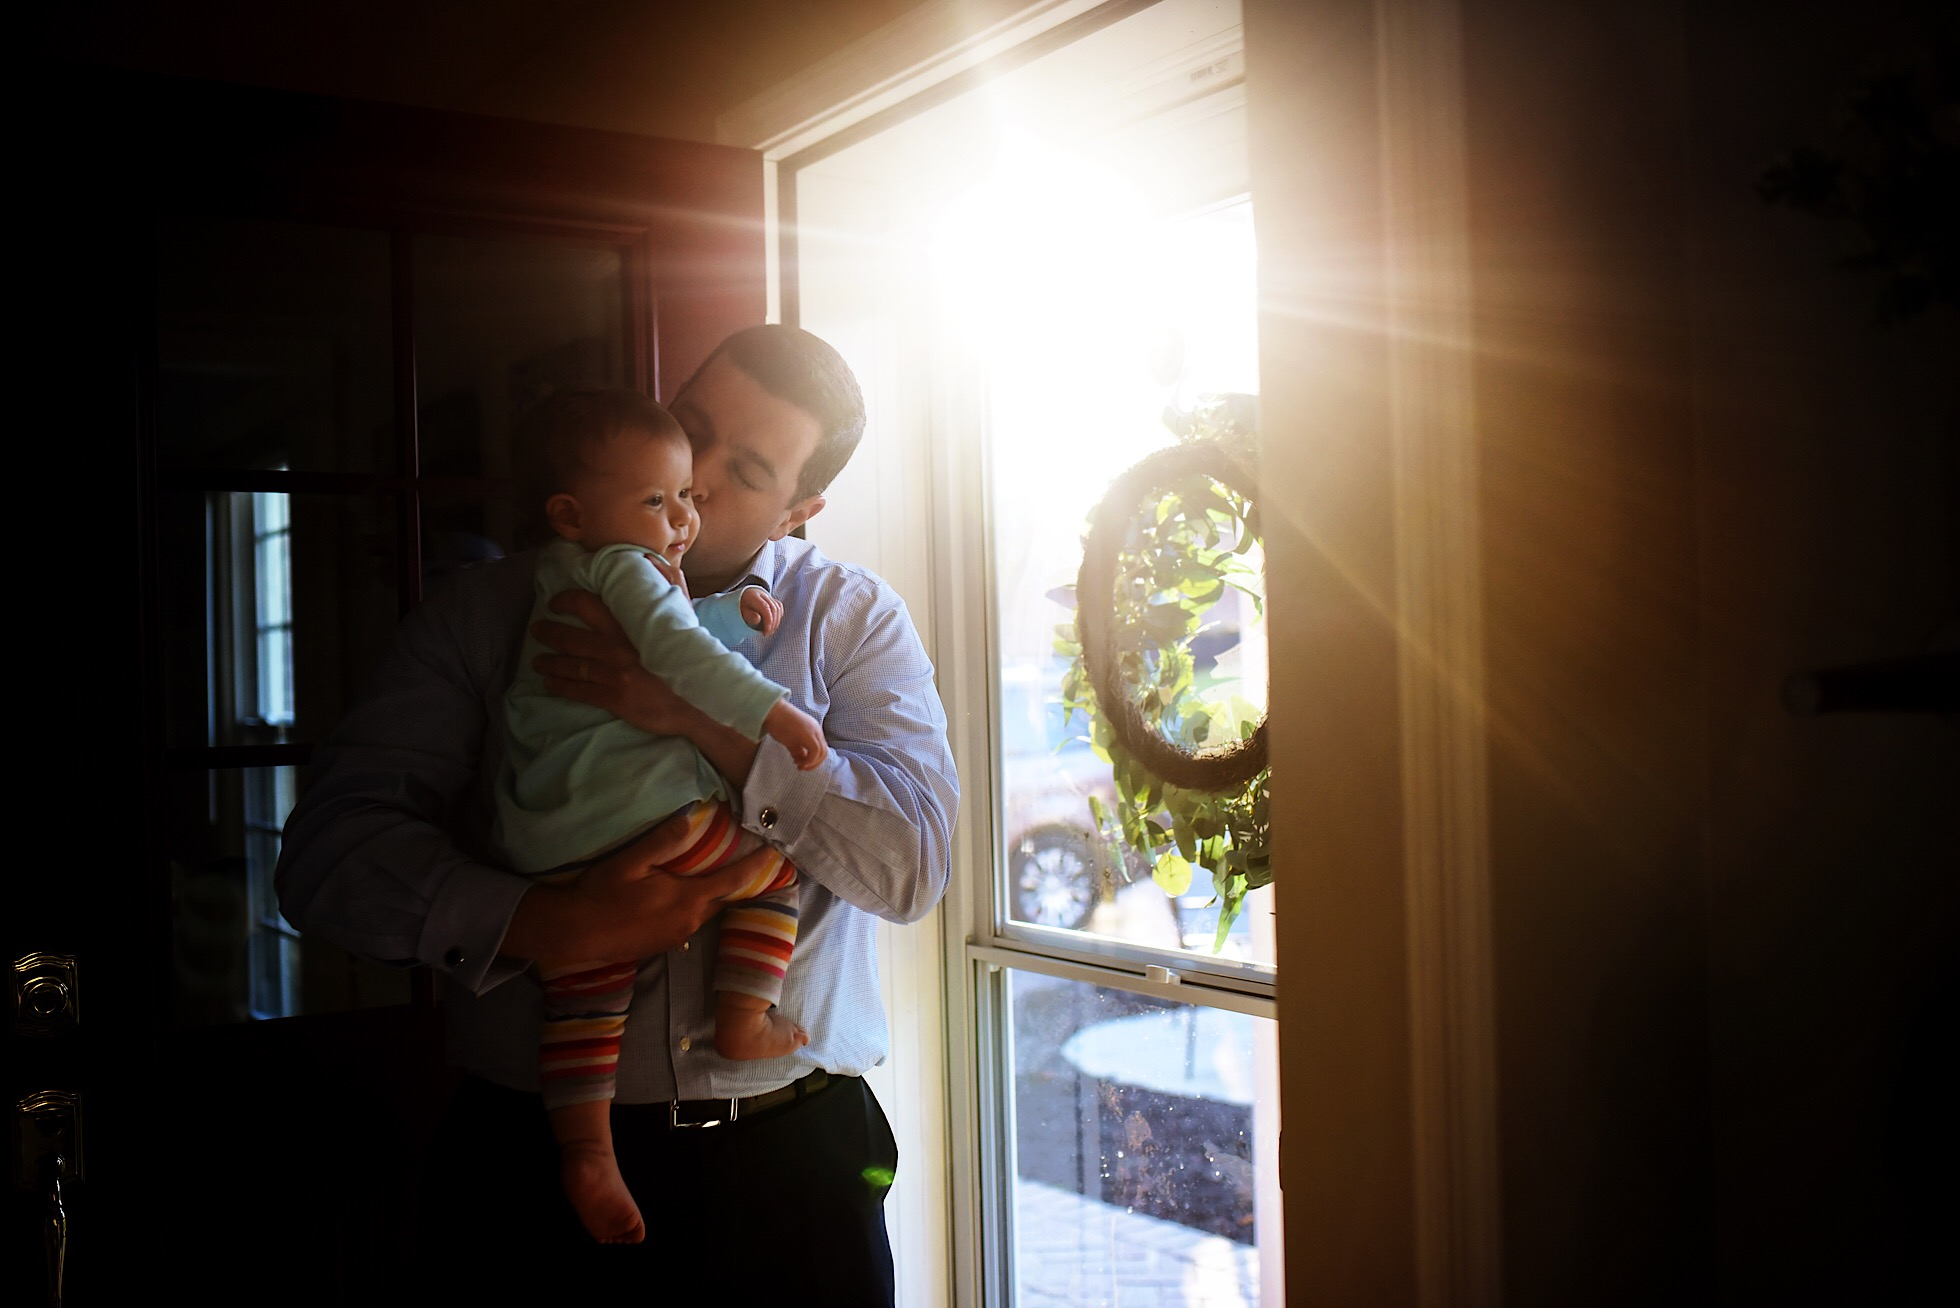 A dad kisses his baby